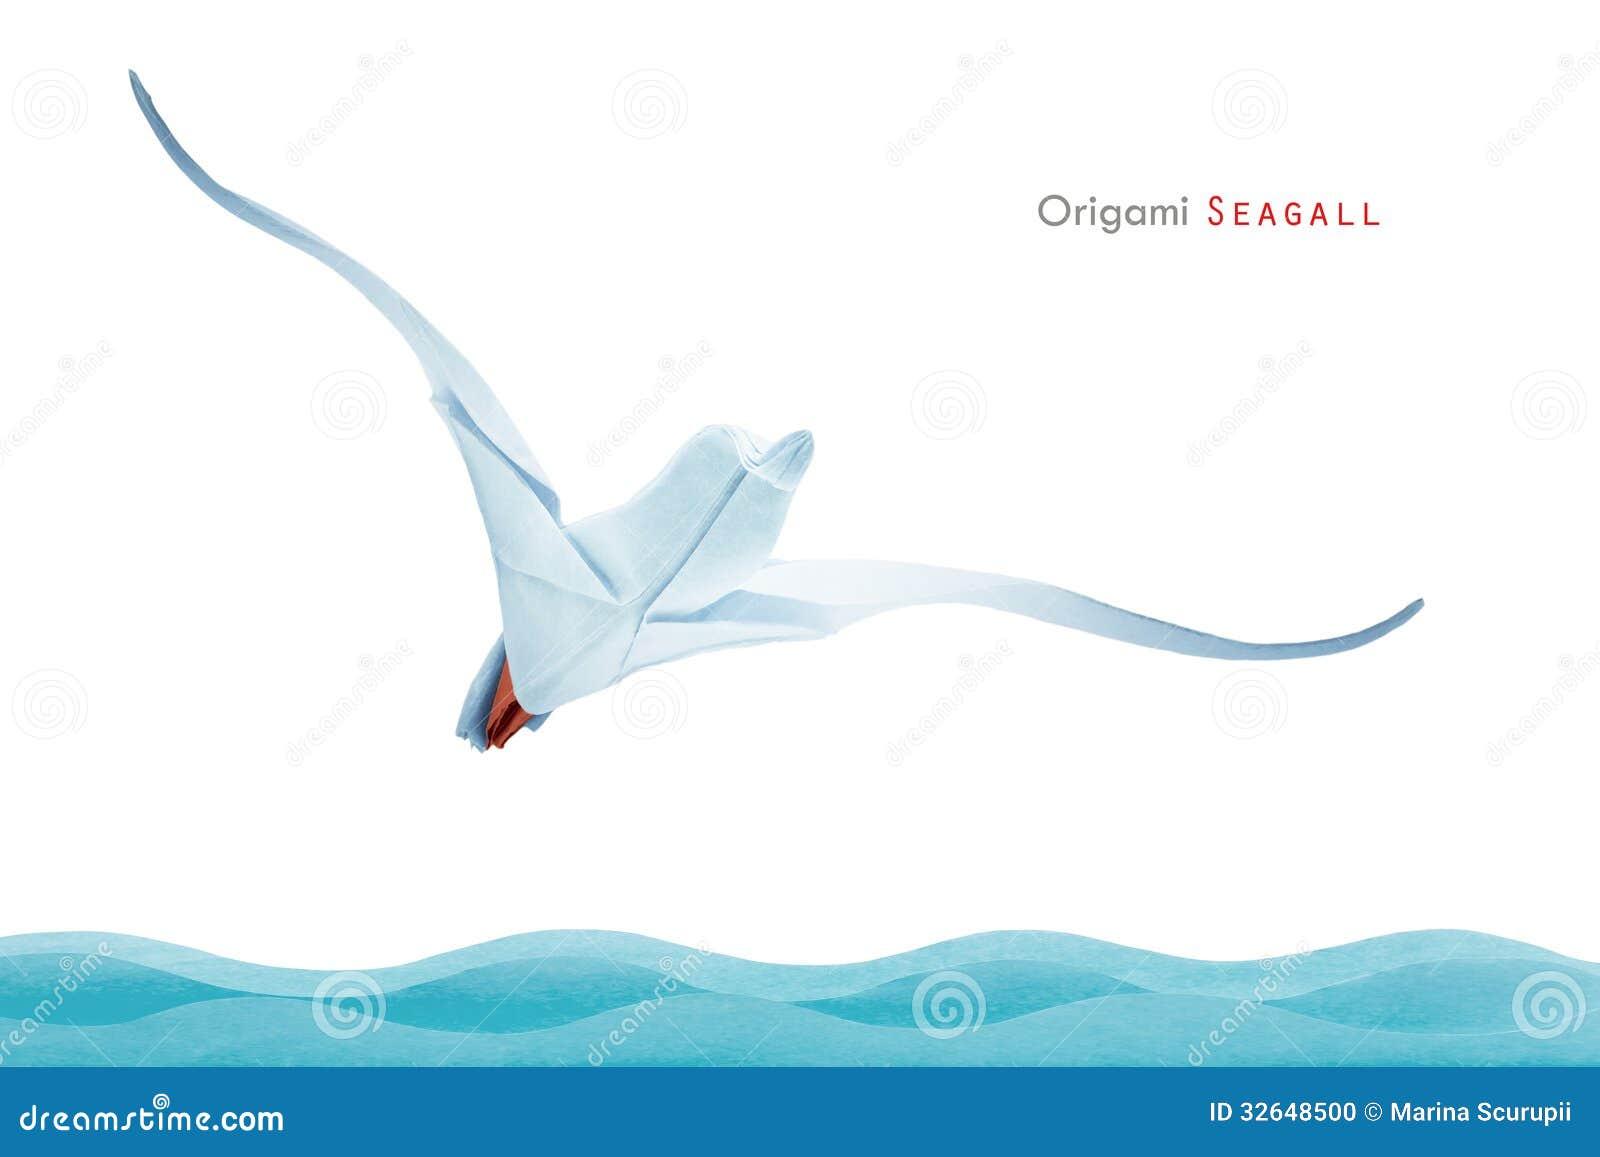 Origami seagull